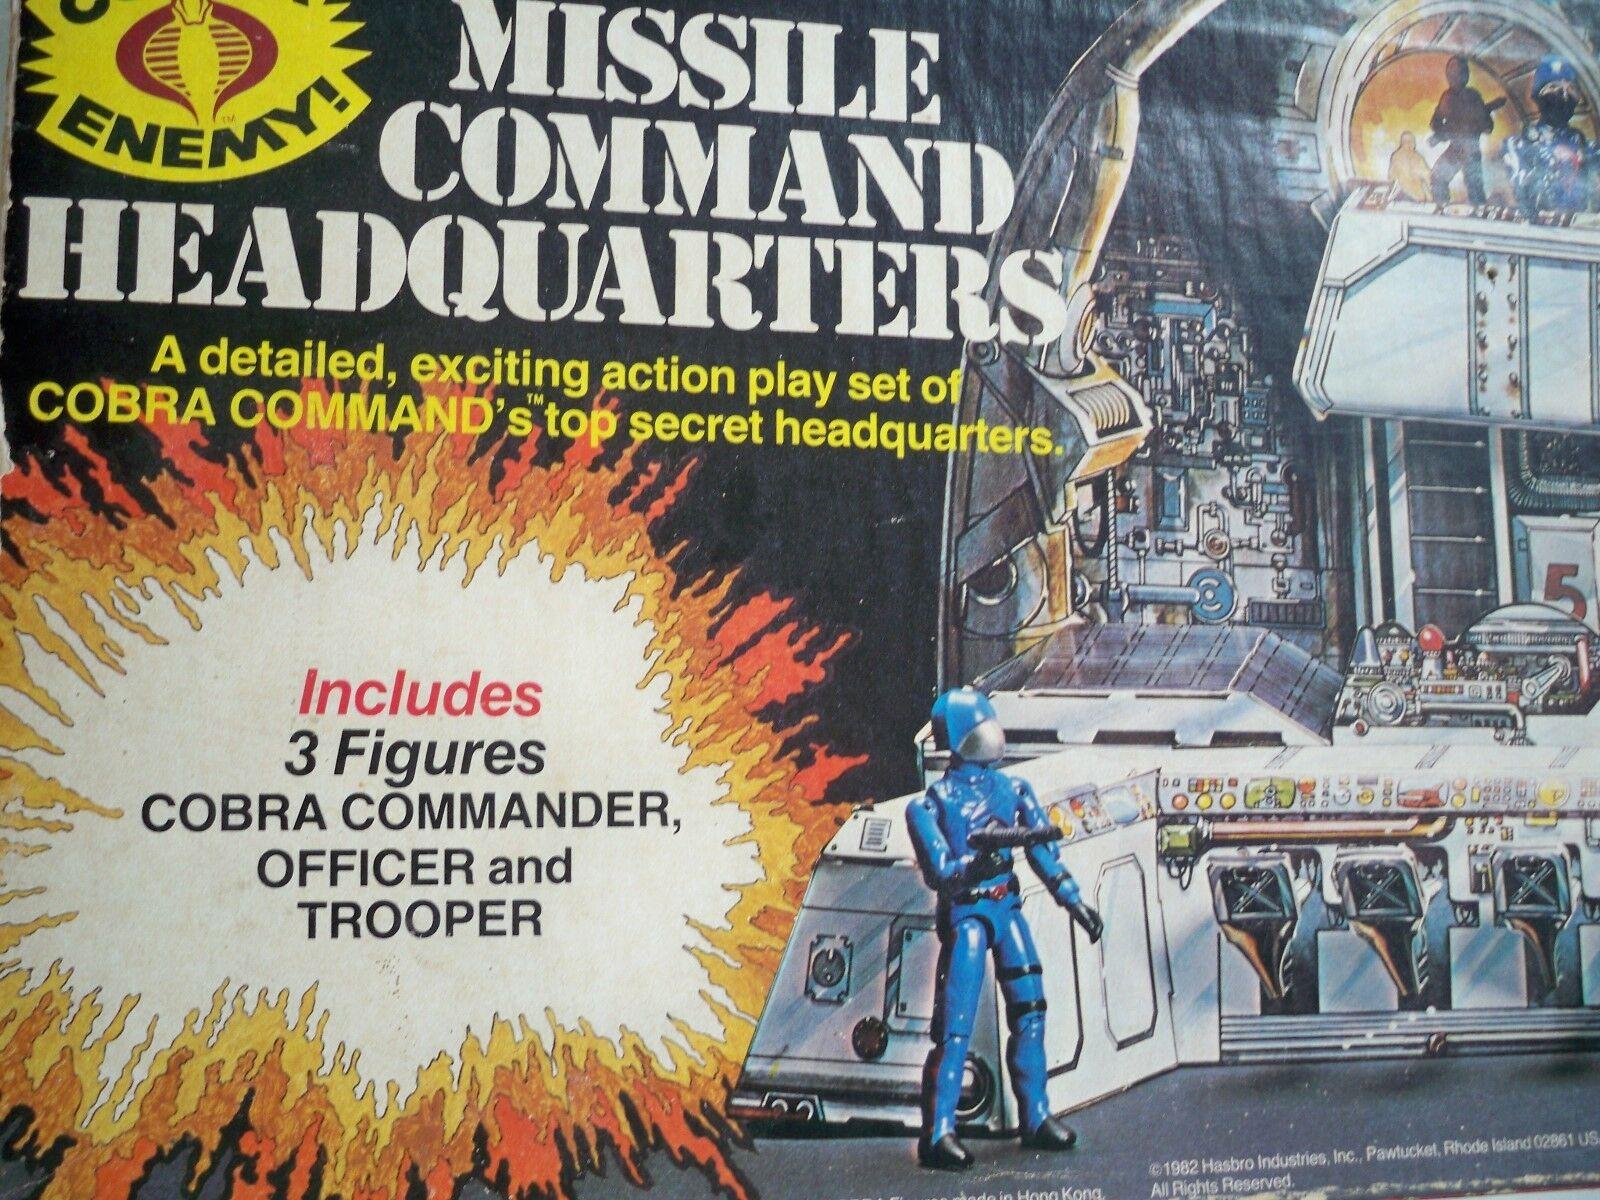 K1877708 MISSILE COMuomoD HEADQUARTERS W scatola GI JOE COBRA 1982  SEARS VINTAGE  marchi di moda